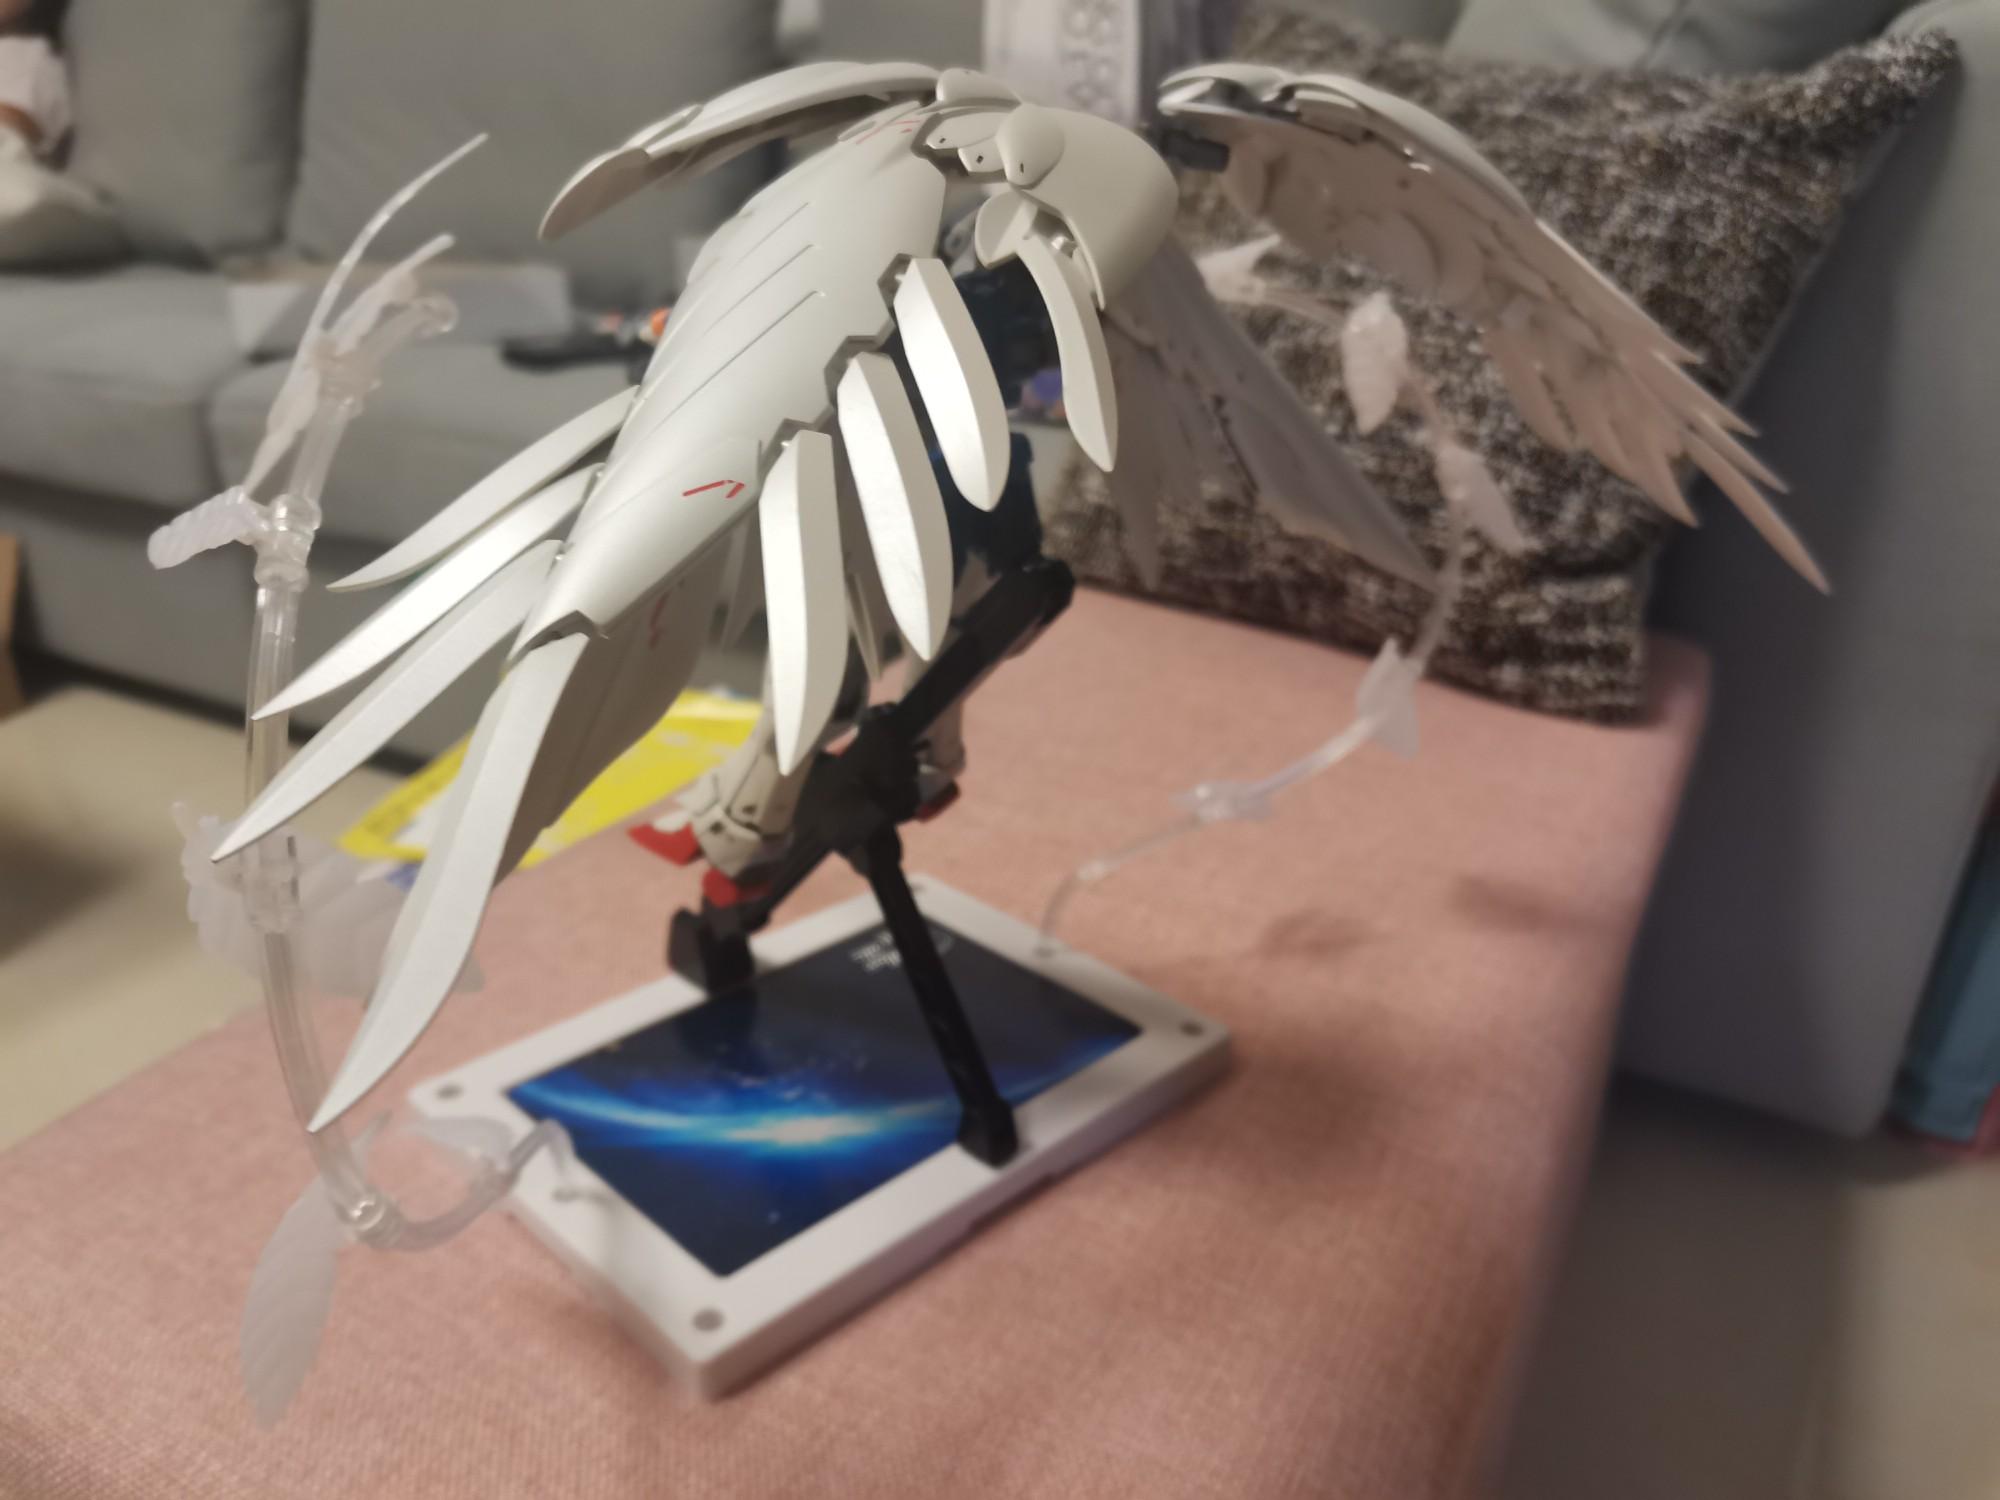 S610_navigator_MG_wingzero_review_010.jpg